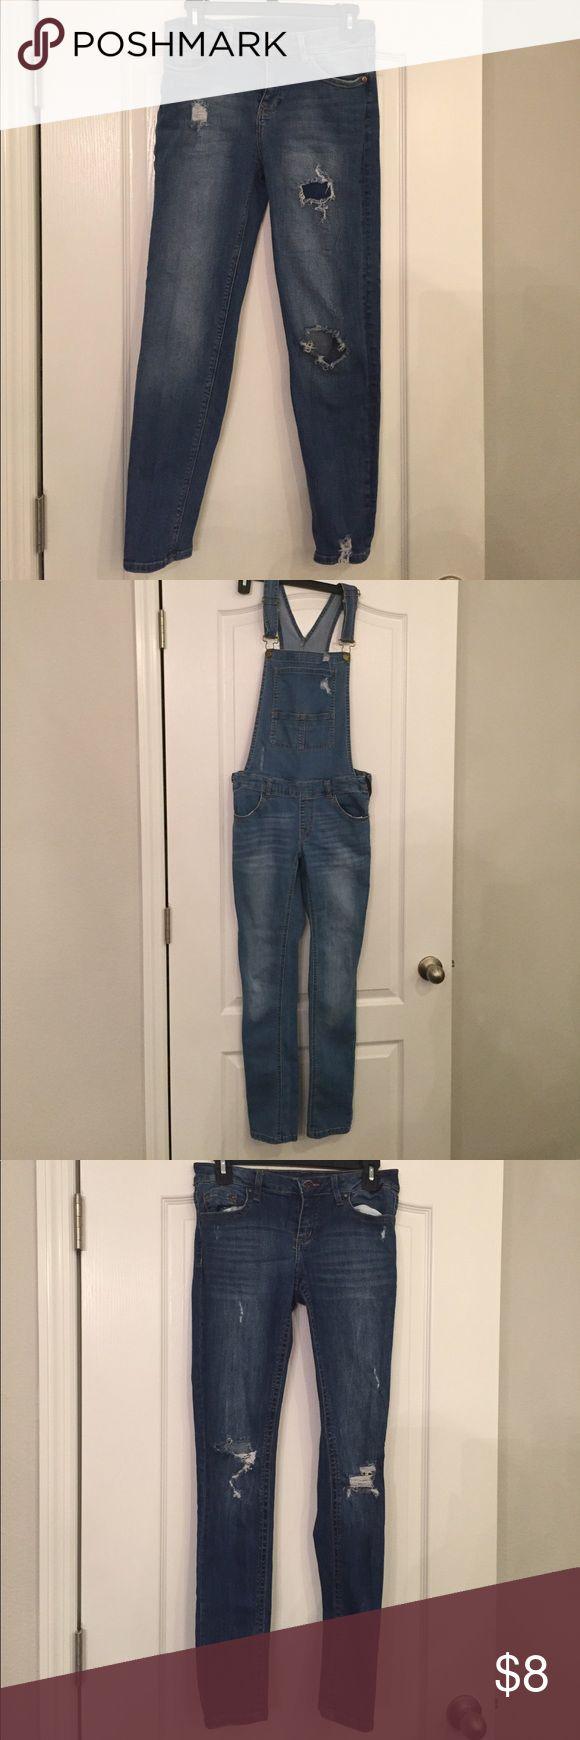 Jeans Zco Jeans Tillys Pants Skinny